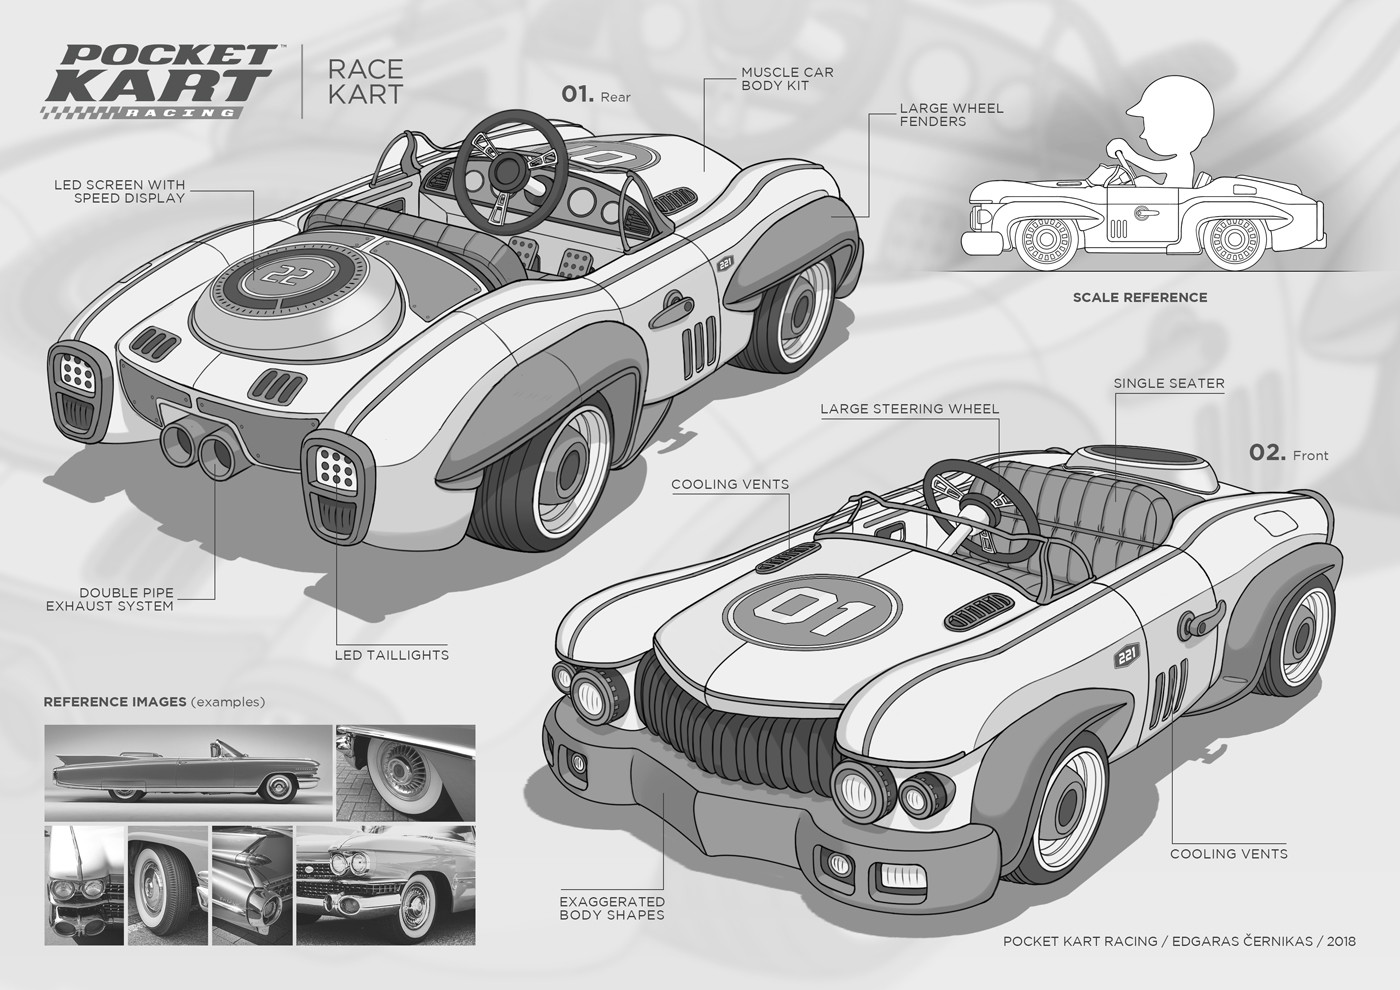 Edgaras cernikas pocket kart race kart final design 1400x990